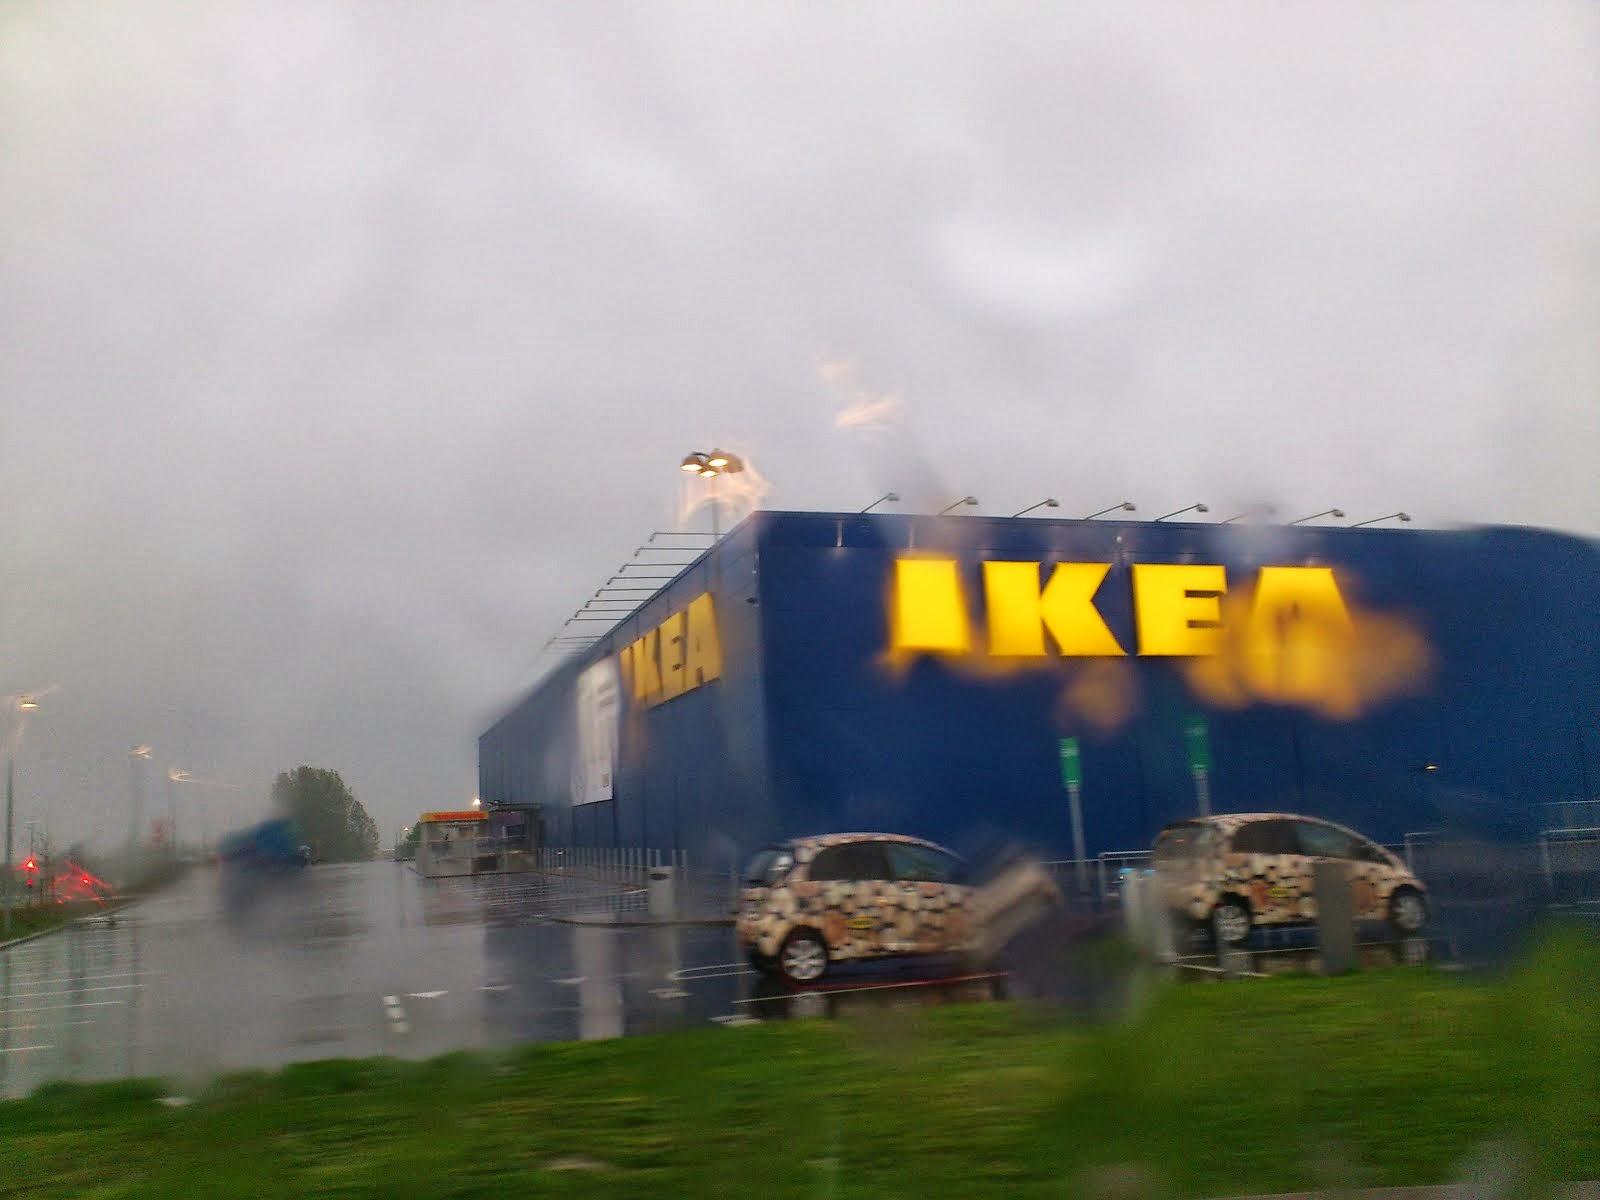 Johansens Journaler Billig Ikea Tur